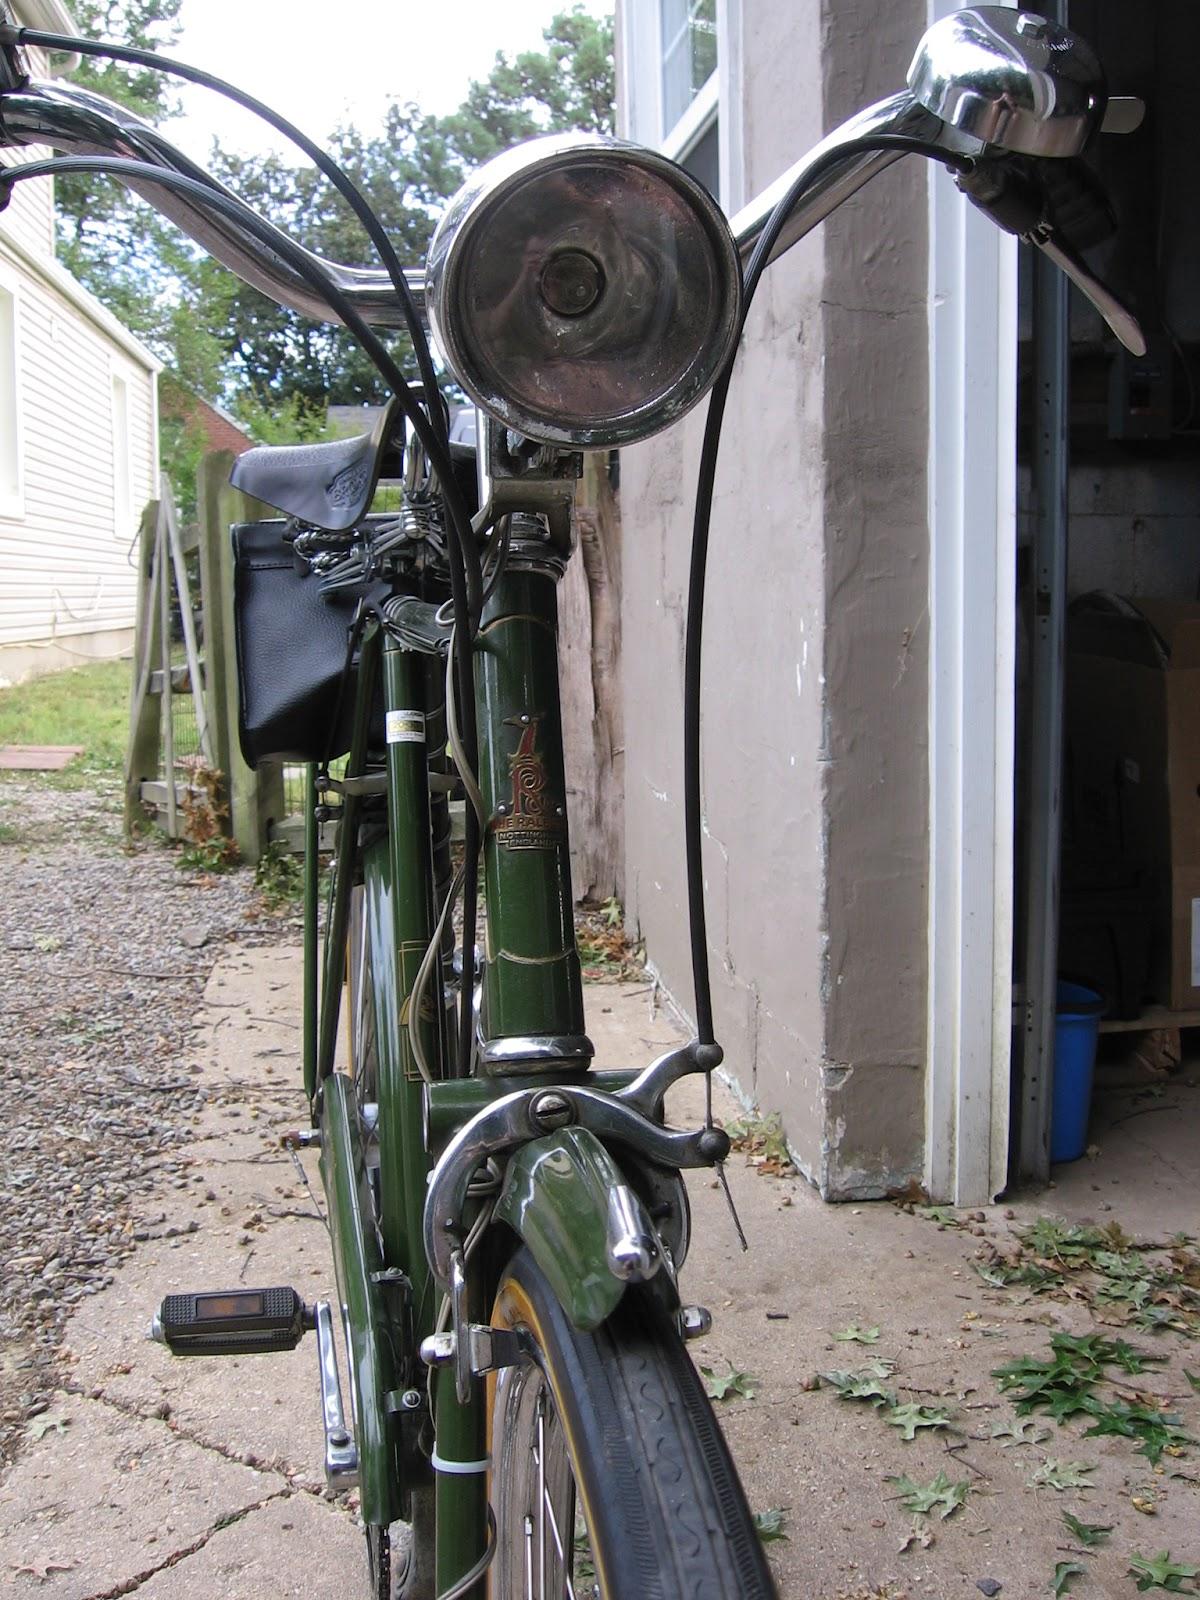 V bike shoe and shoe brake rod vintage retro bike